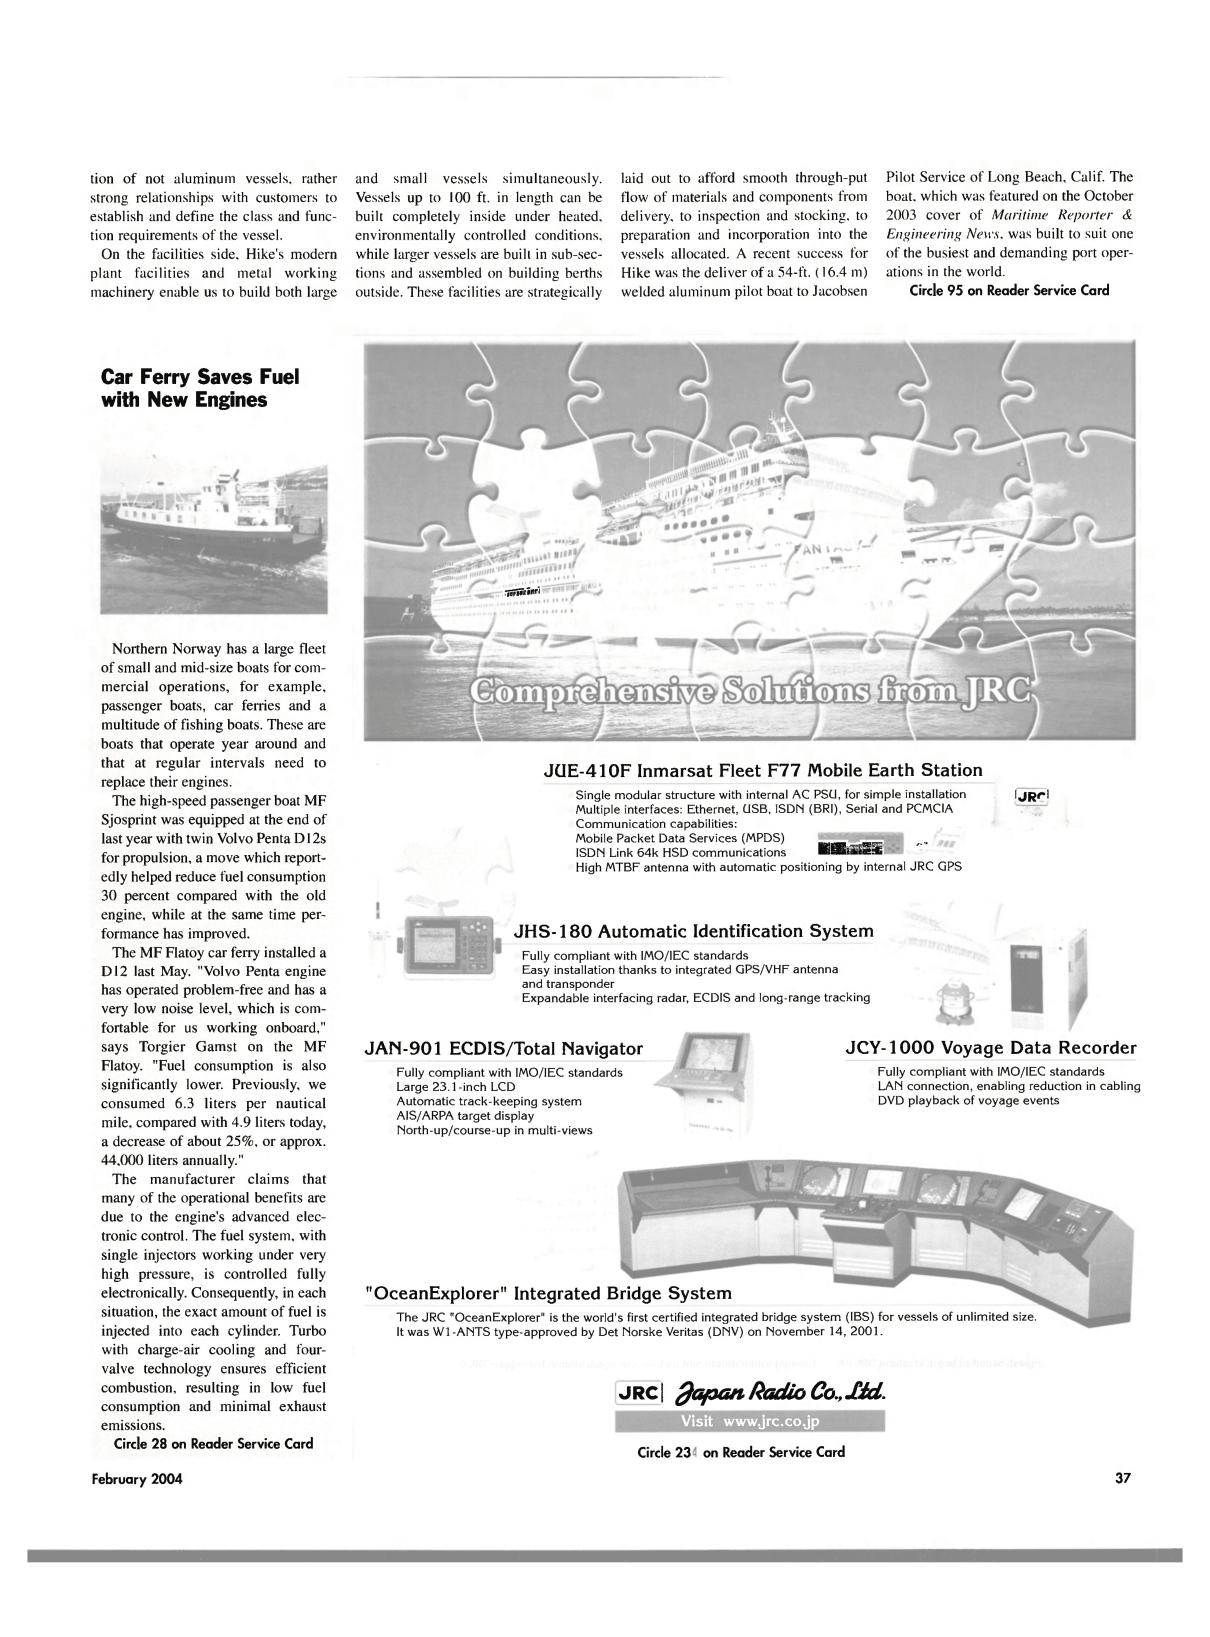 Viewmaritime Reporter And Engineering News February 2004 Navigator Wiring Fm Antenna Diagram 42